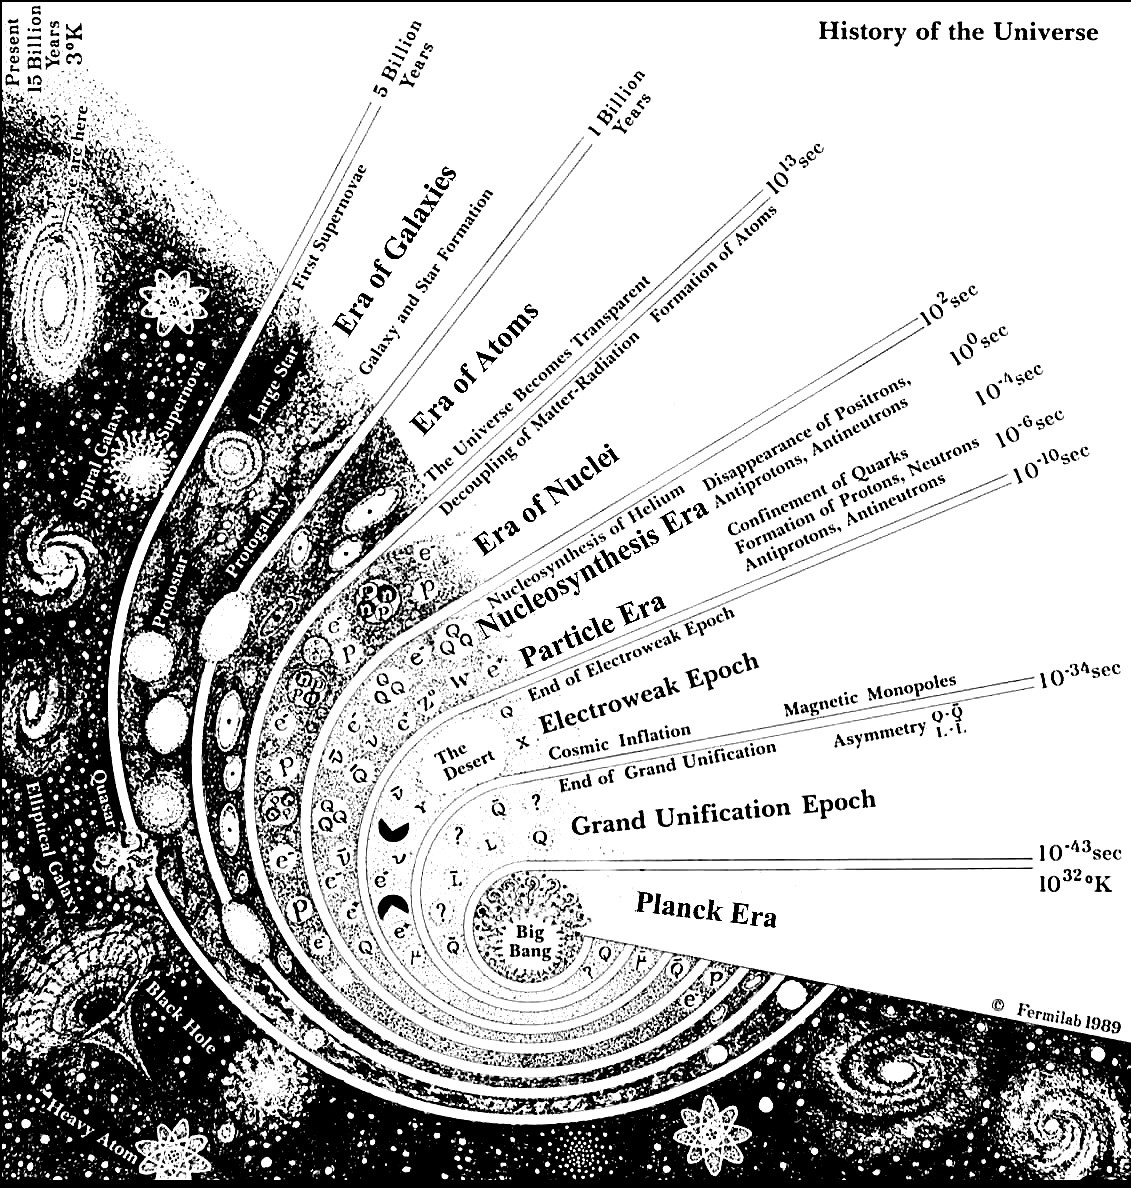 Bioquimica onde estudar